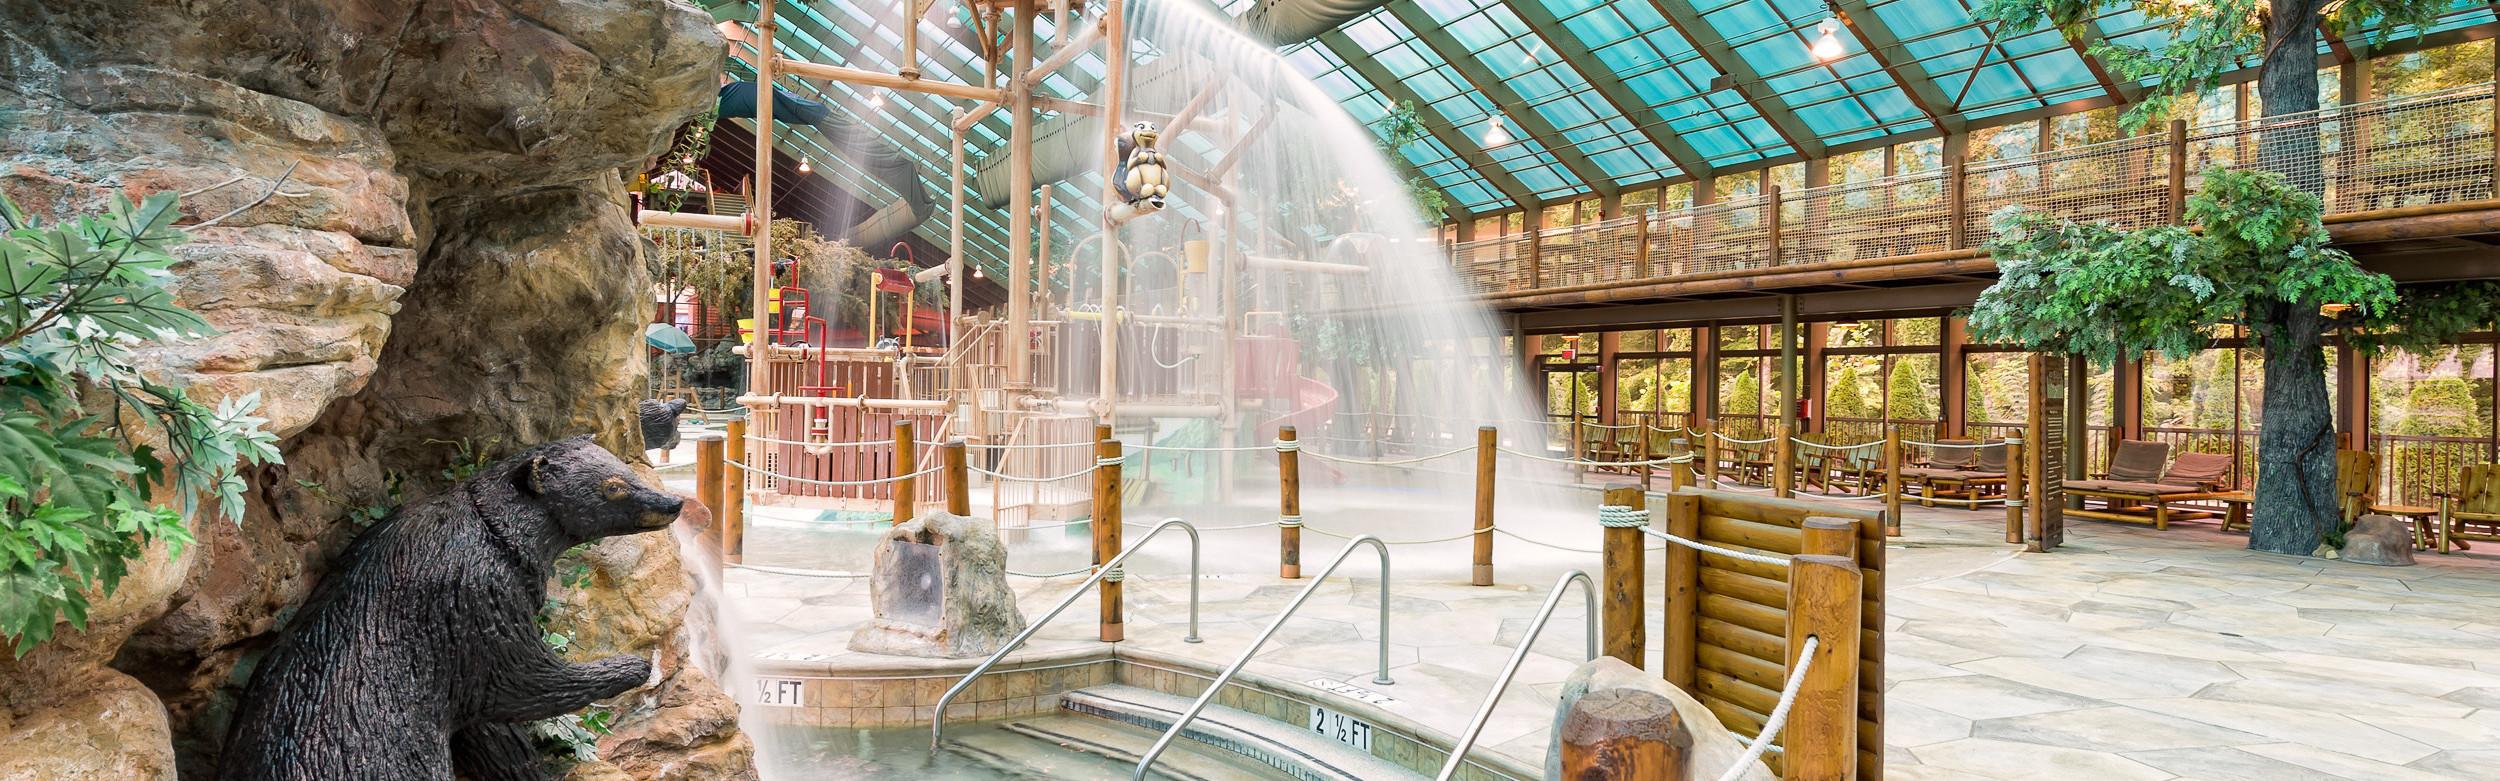 water parks in tennessee | gatlinburg water park | westgate smoky